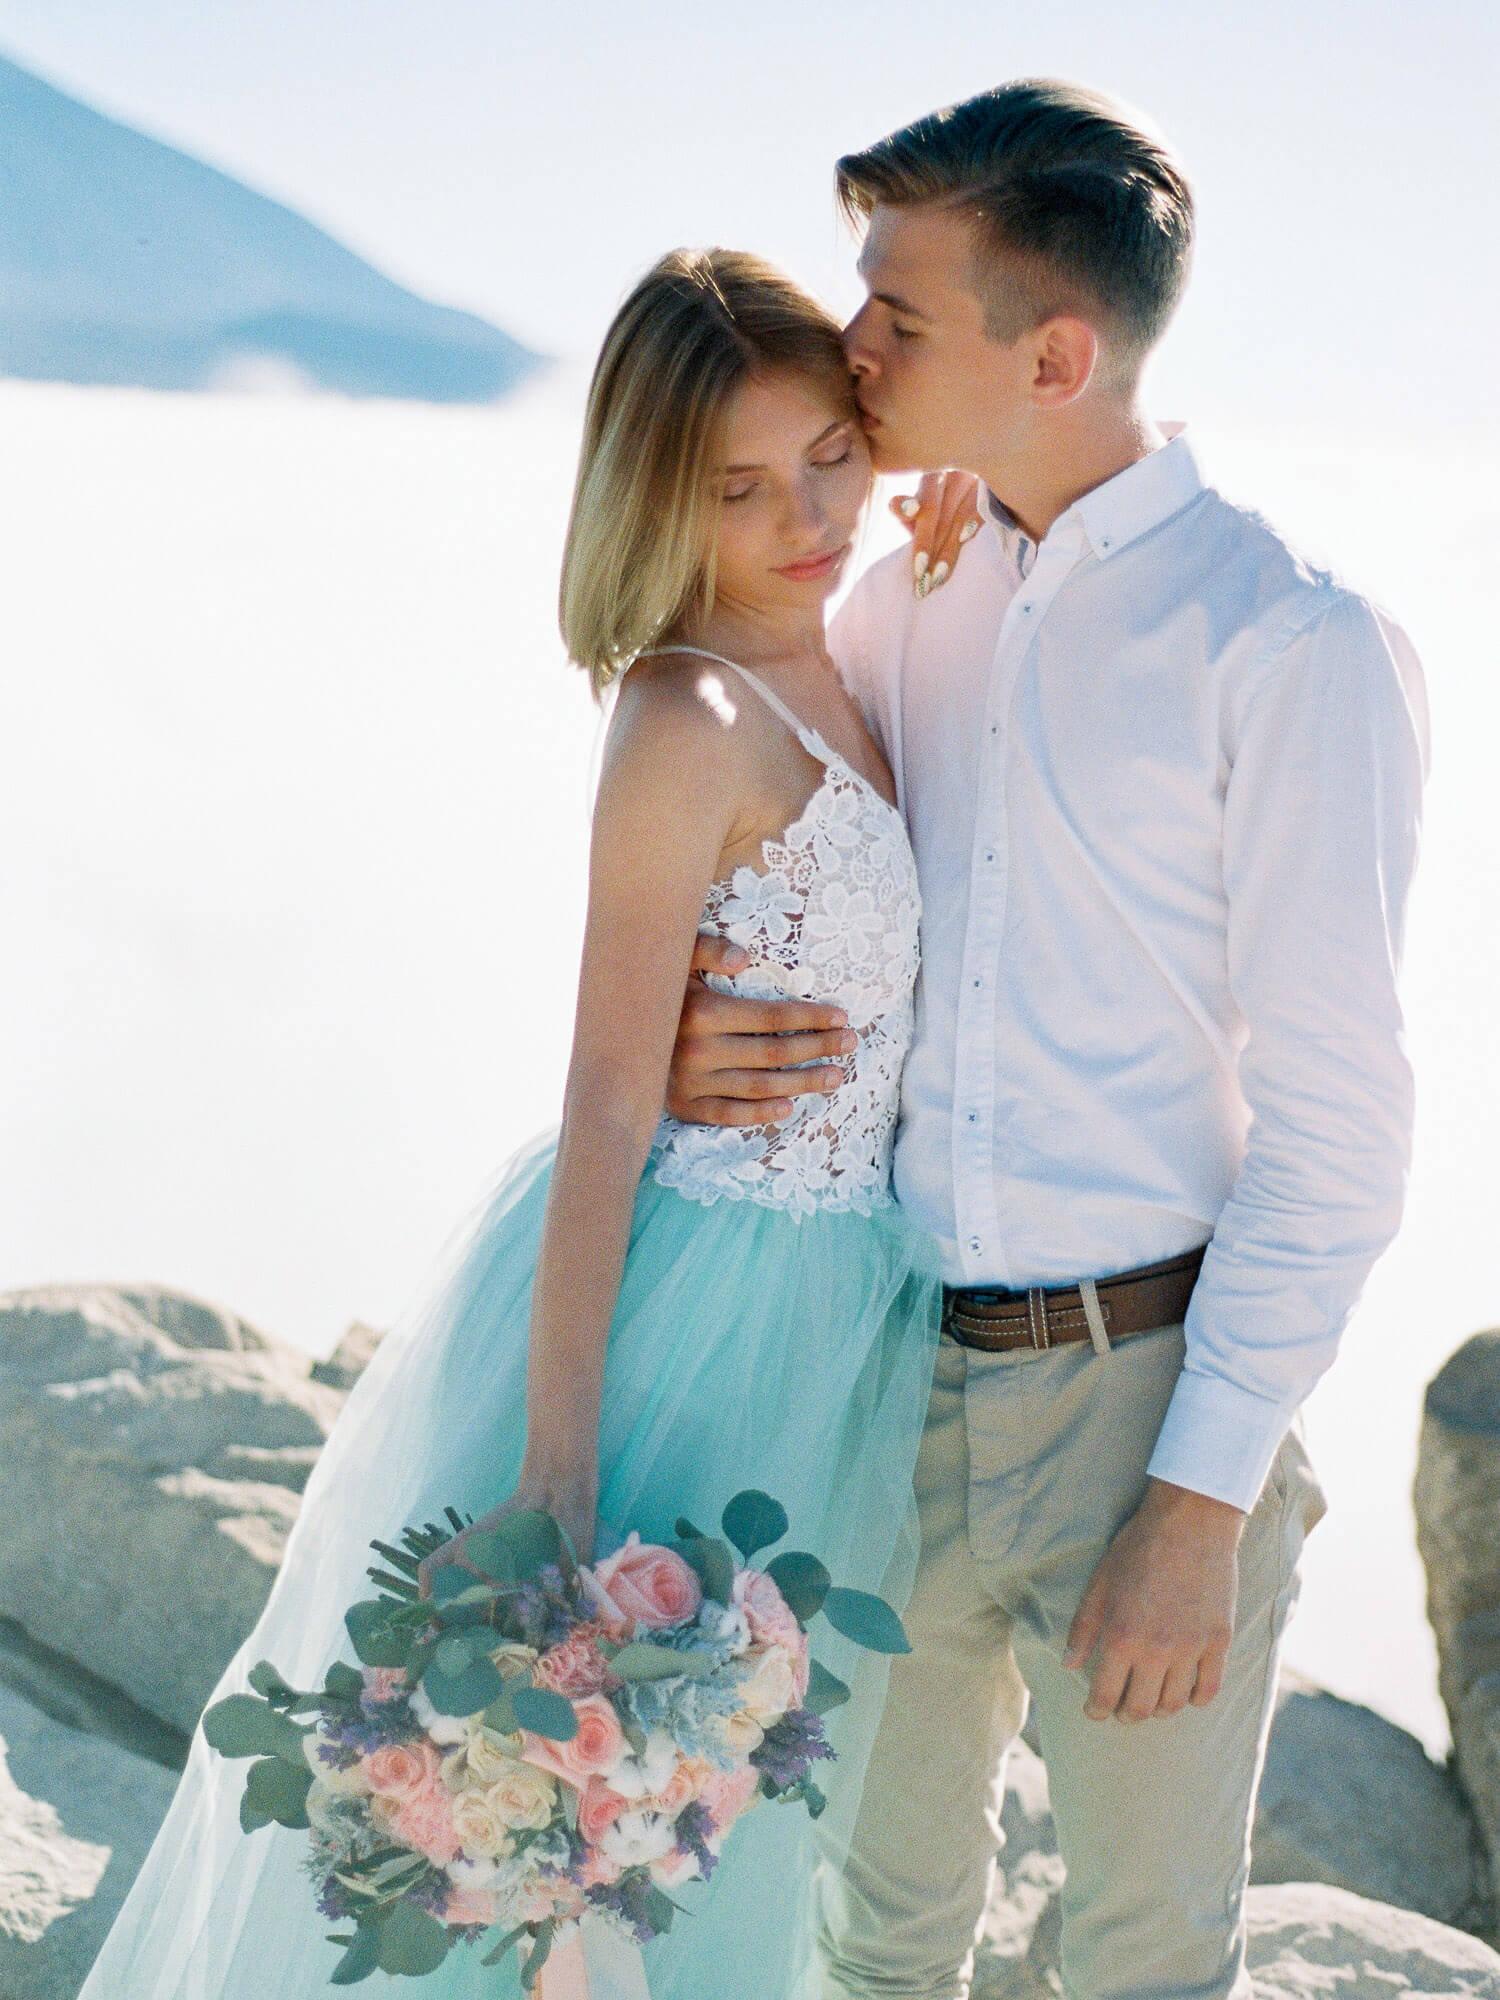 couple photoshoot in Tenerife